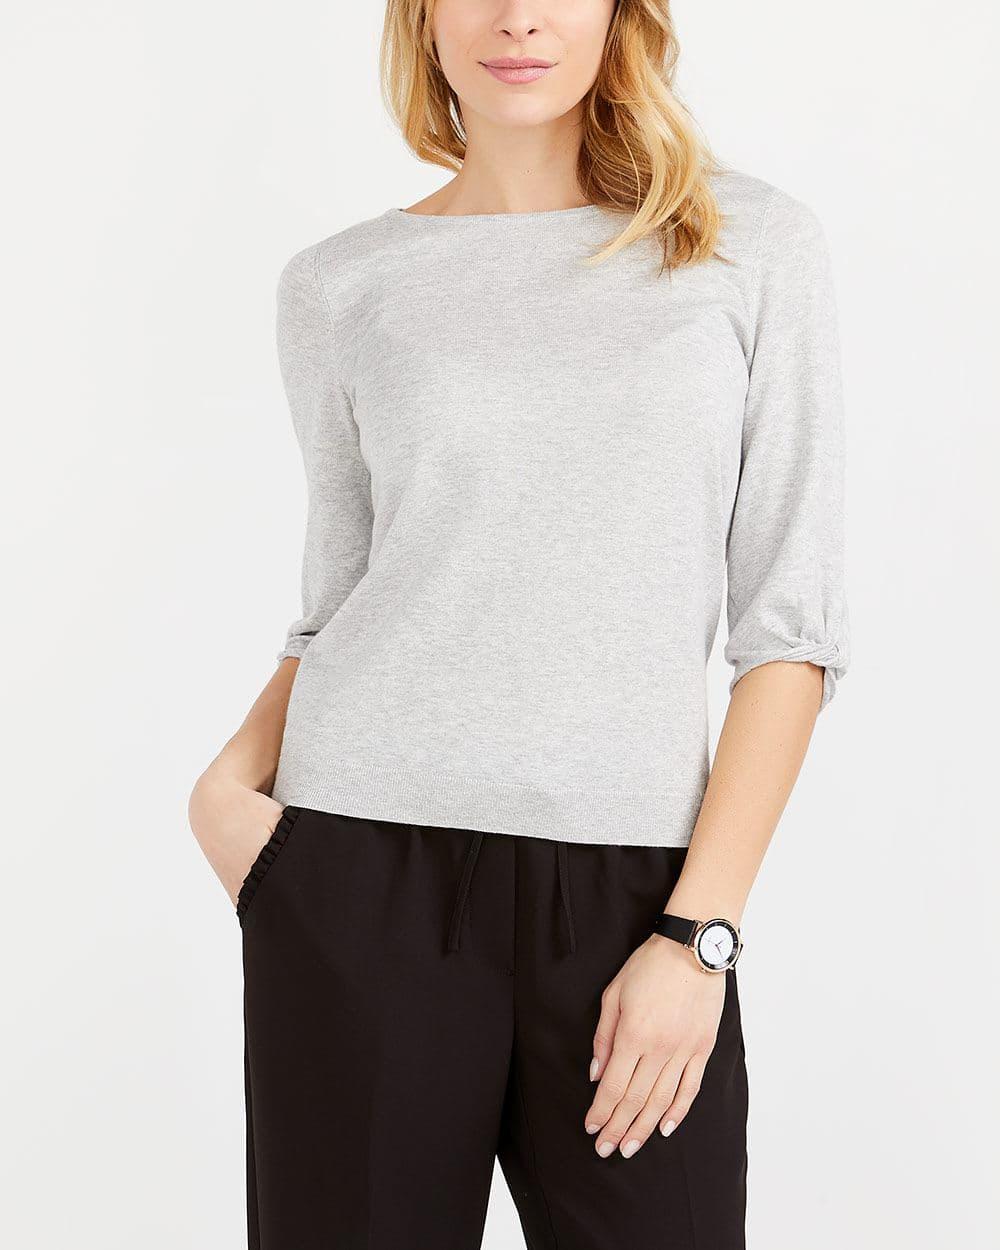 Twist ¾ Sleeve Sweater